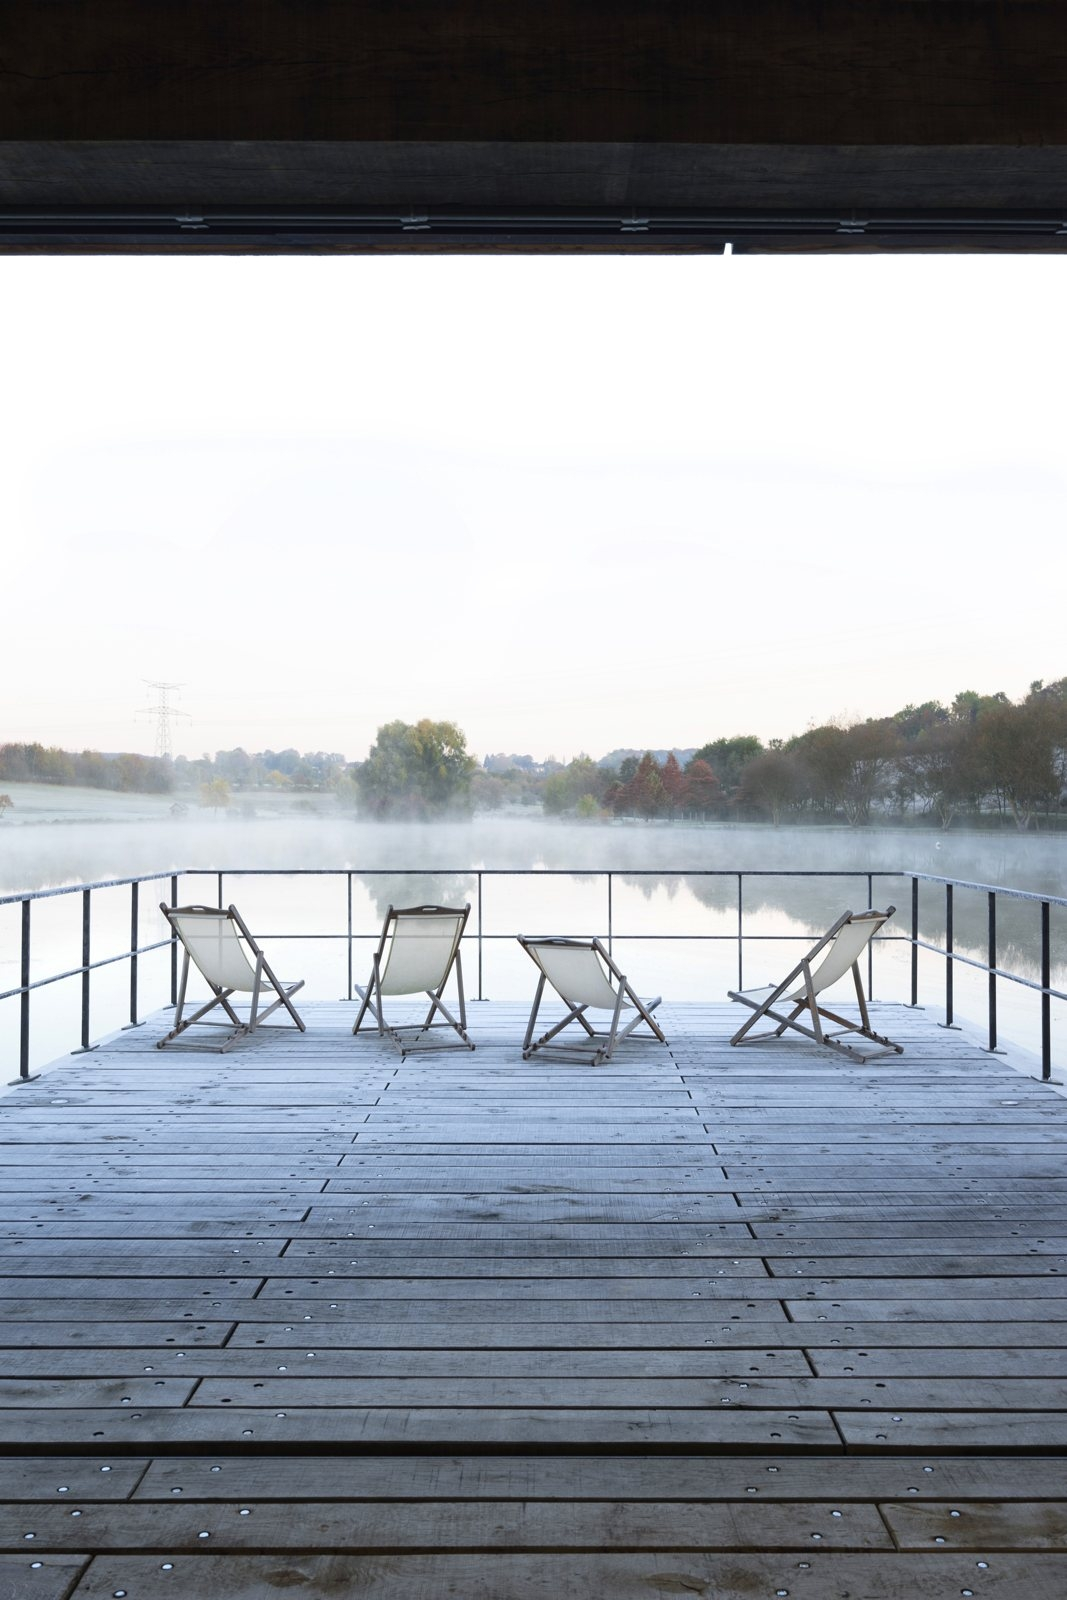 Wooden deck lake. Conference ro - upinteriors   ello